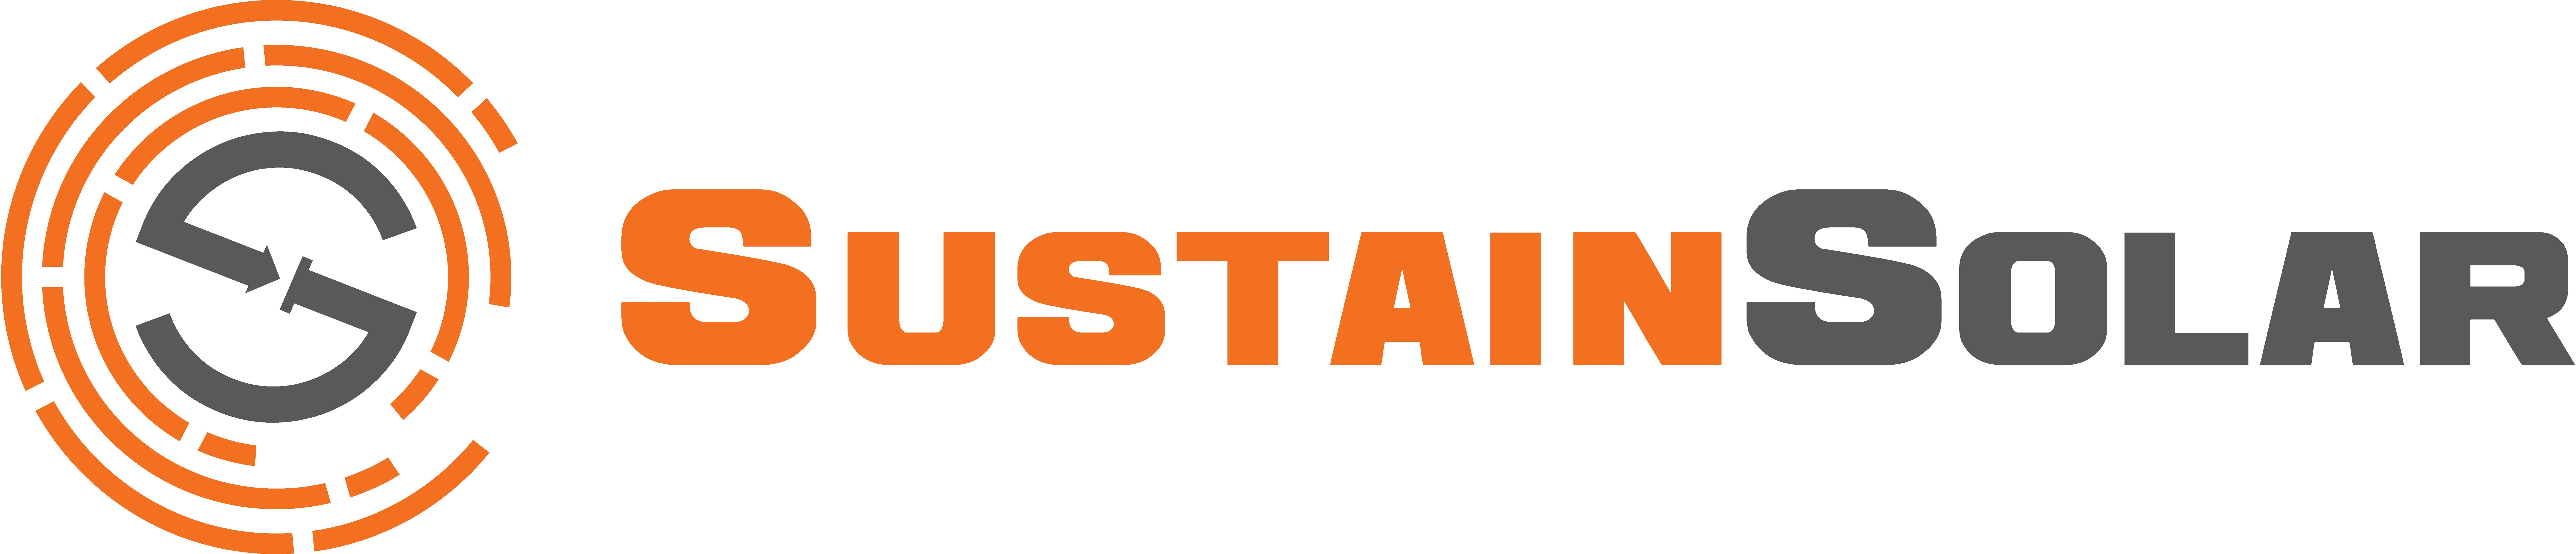 Sustain Solar Logo Horizontal